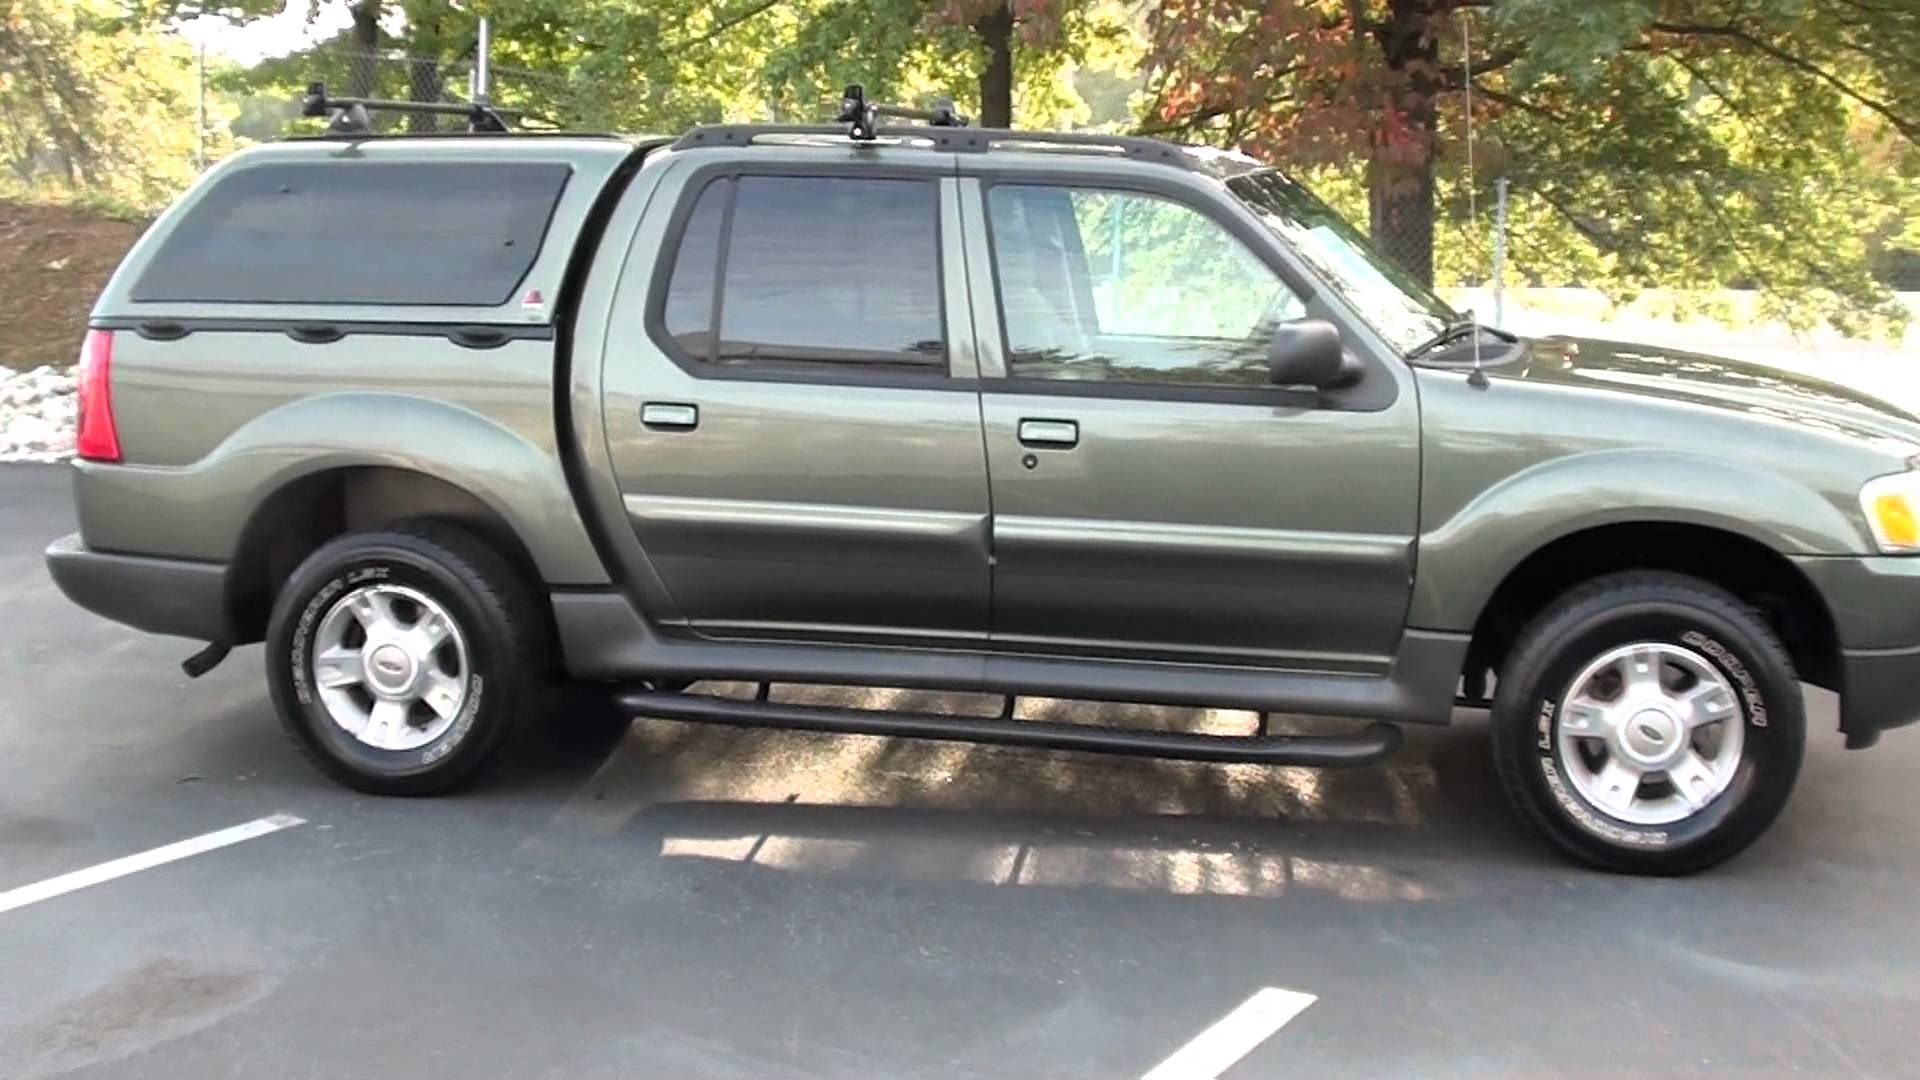 for sale 2004 explorer sport trac xlt !! 1 owner!! stk# p5889 www